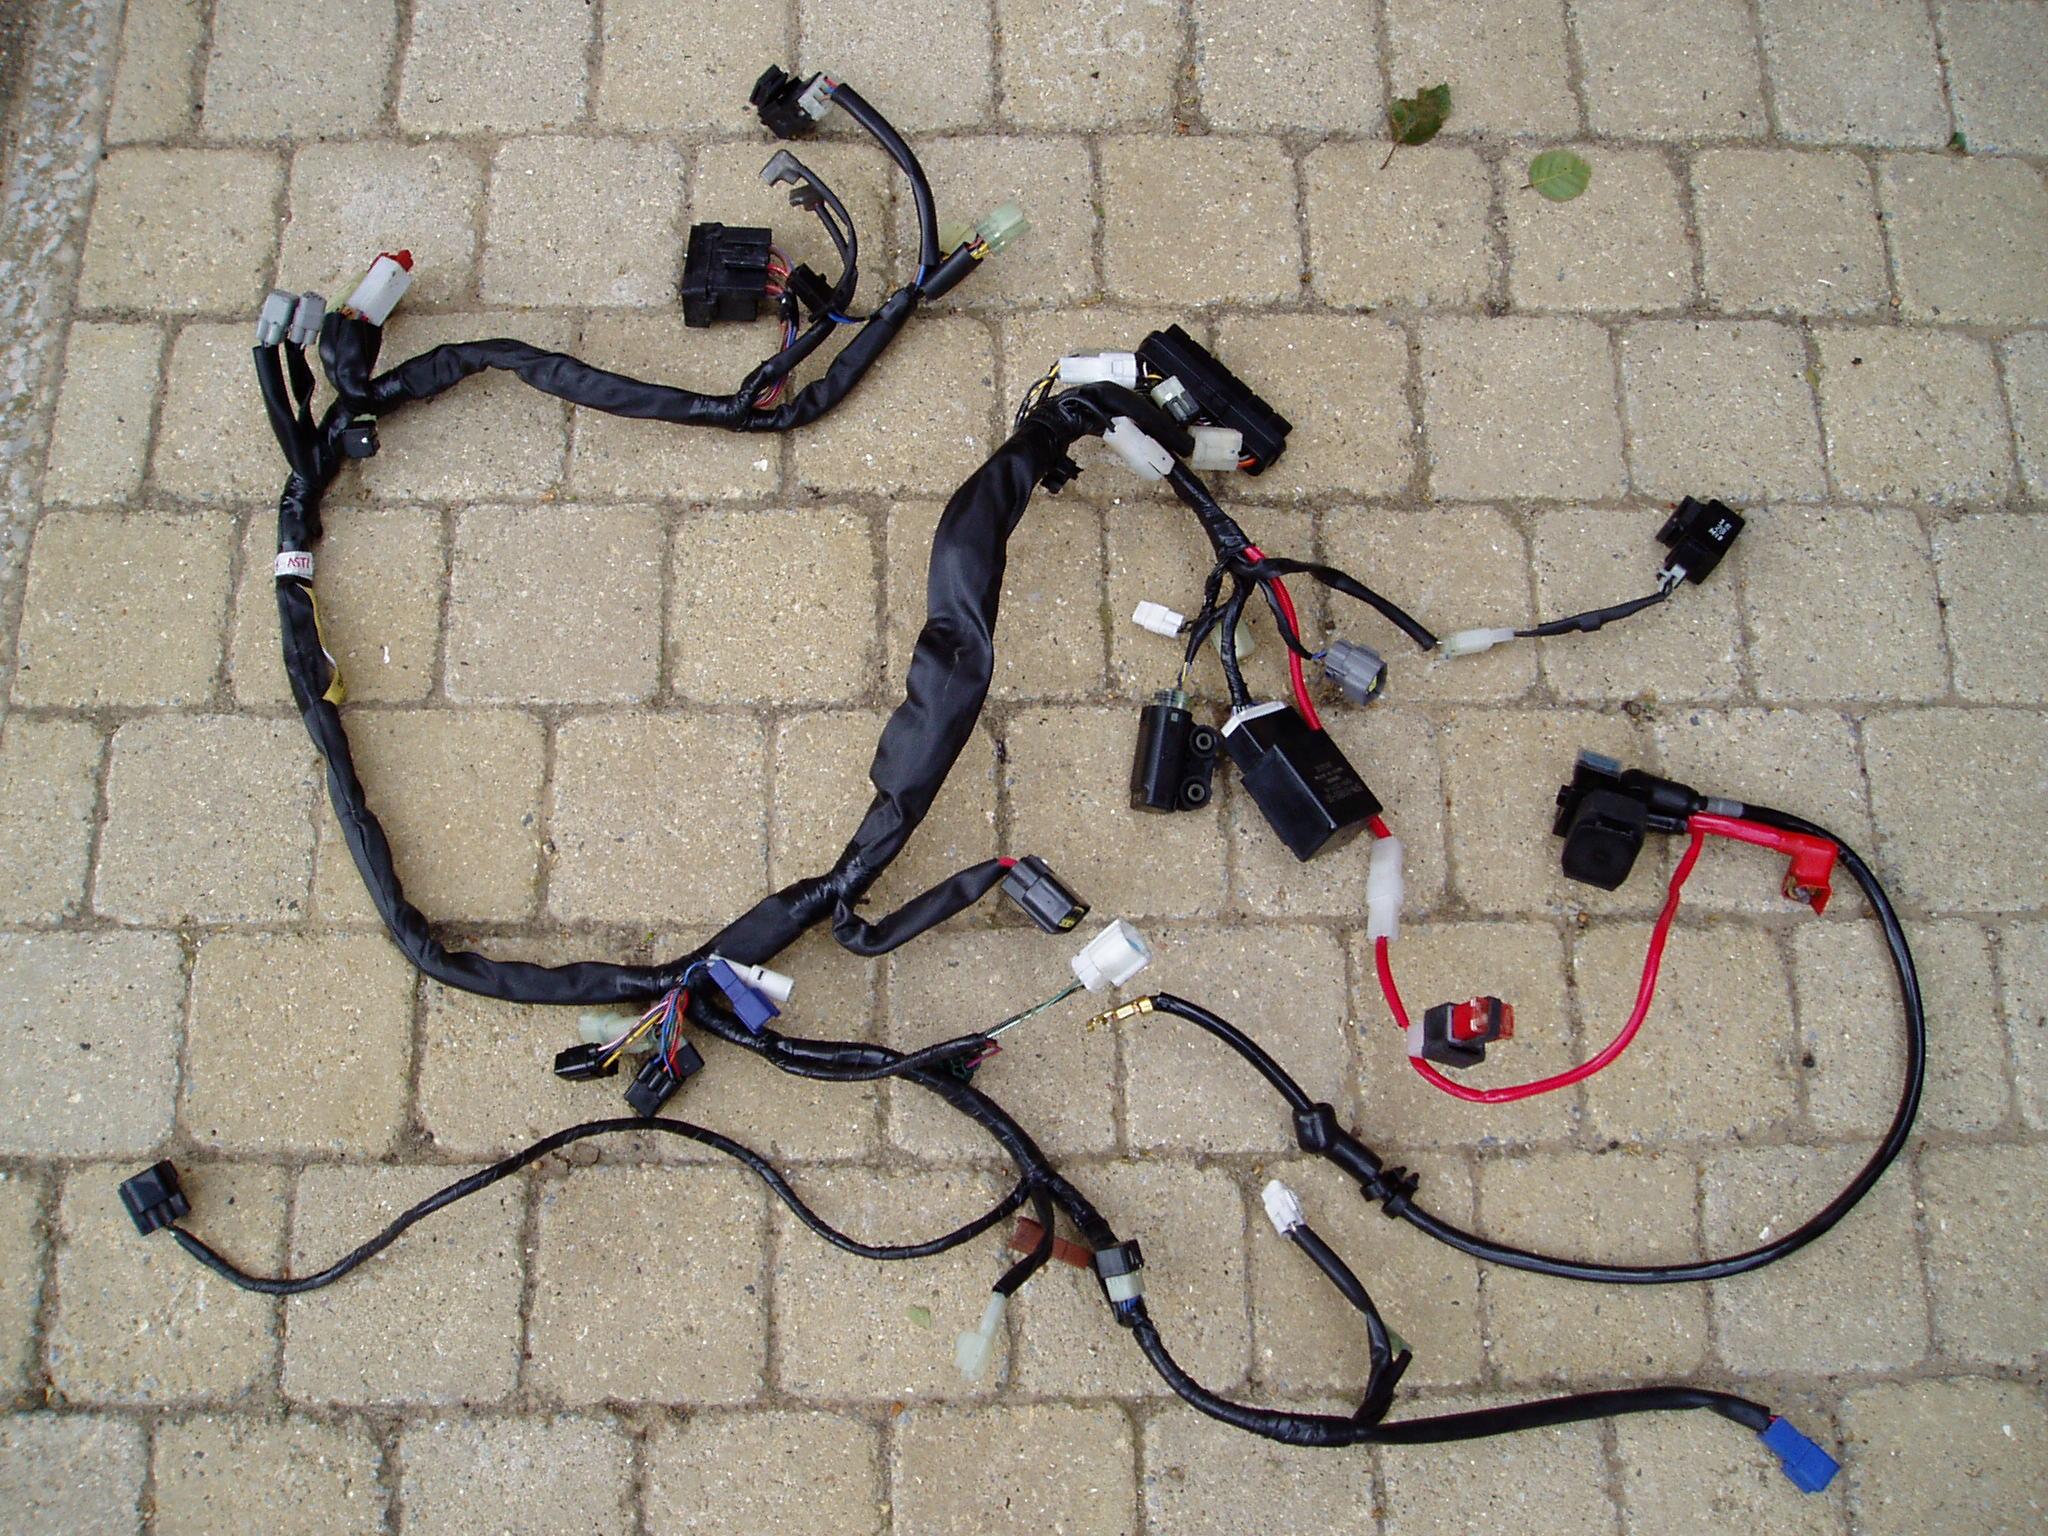 car sub wiring diagram diagrams for trailer lights fisher fury r1 kit design build